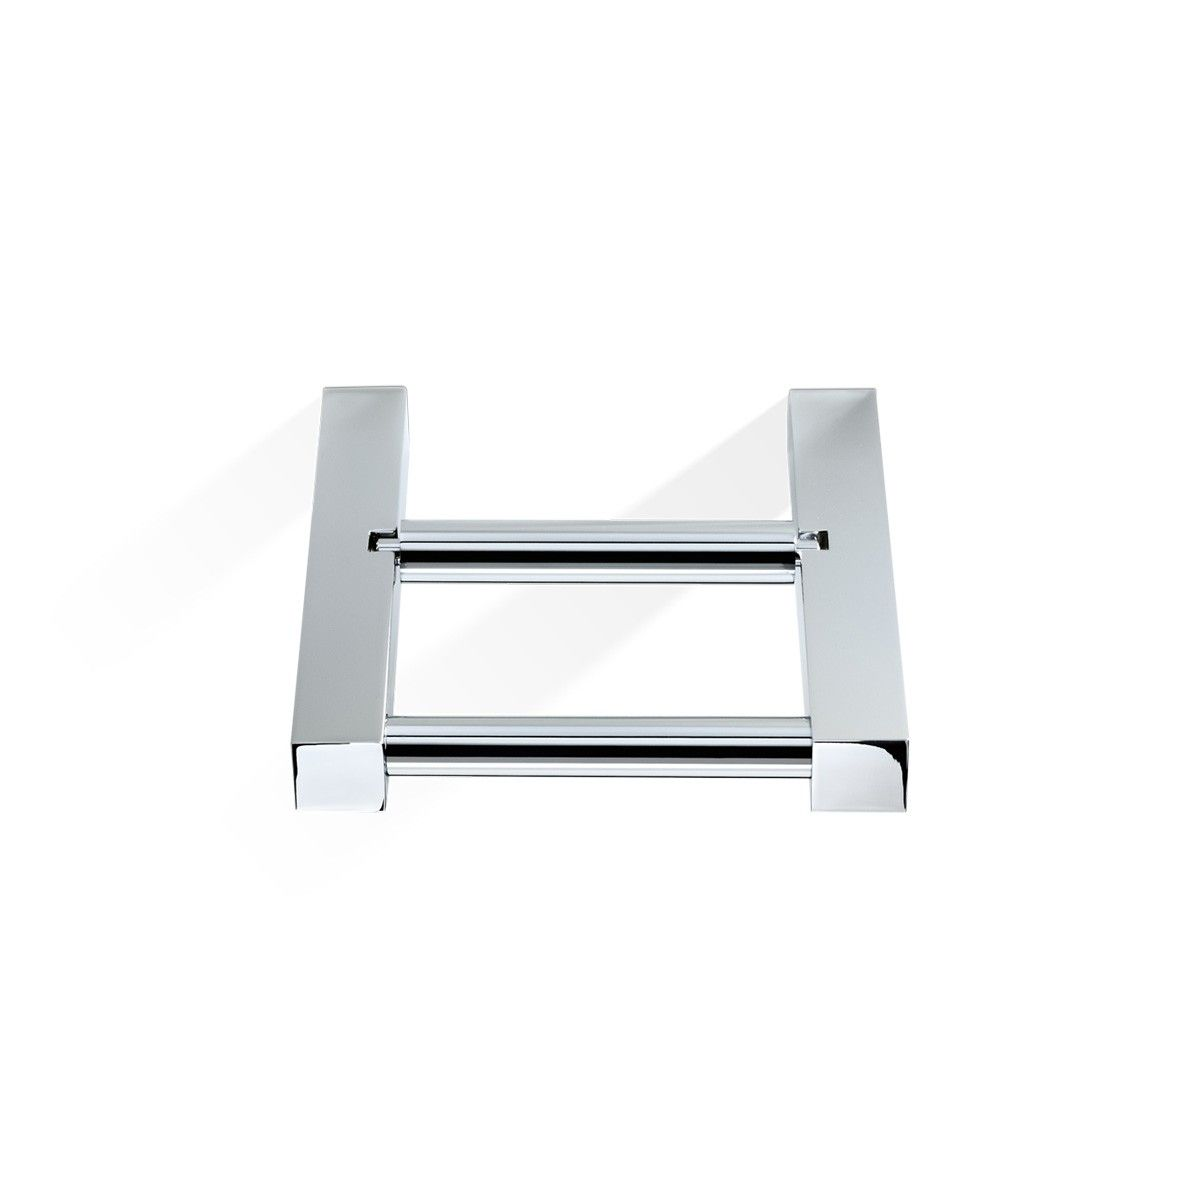 DW BQ TPH5 Toilet Paper Holder in Chrome From the Decor Bath ...